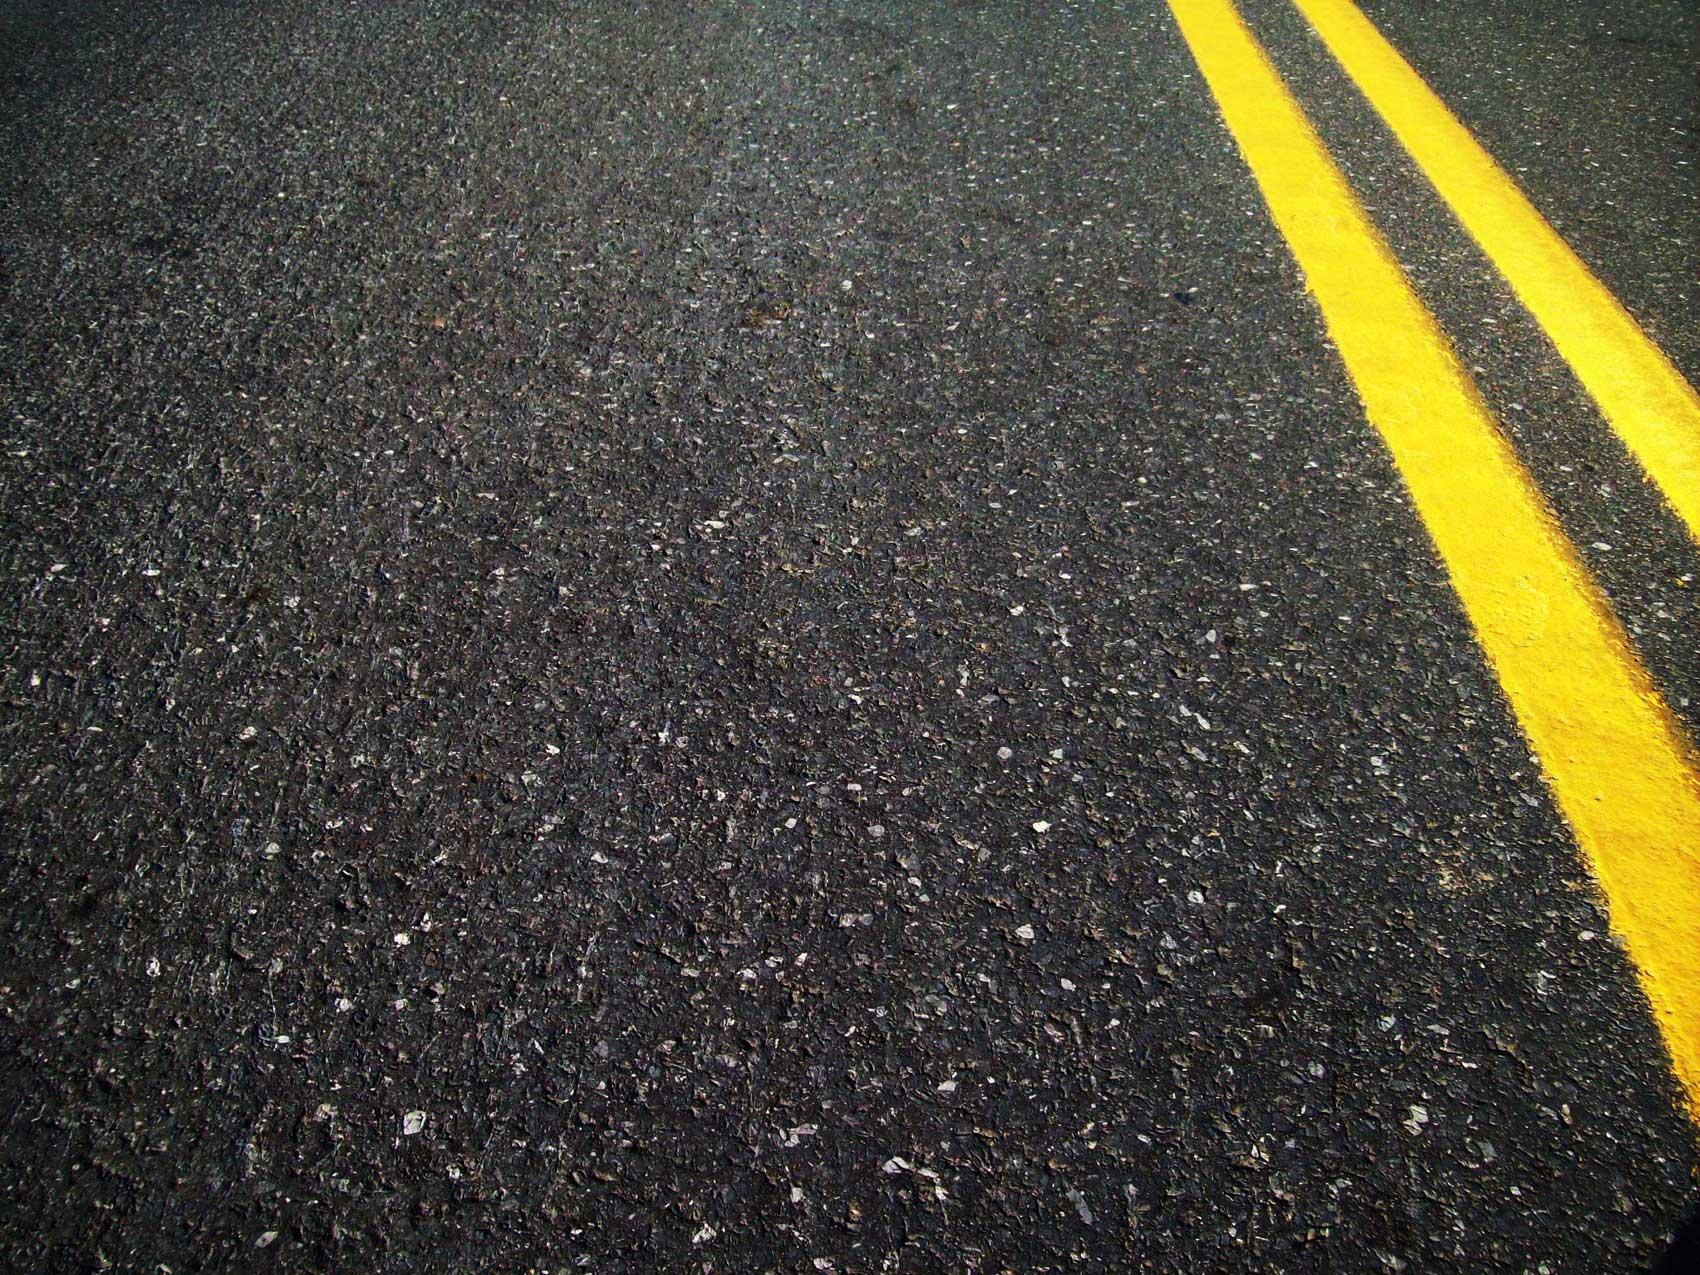 xcitefun asphalt pictures image